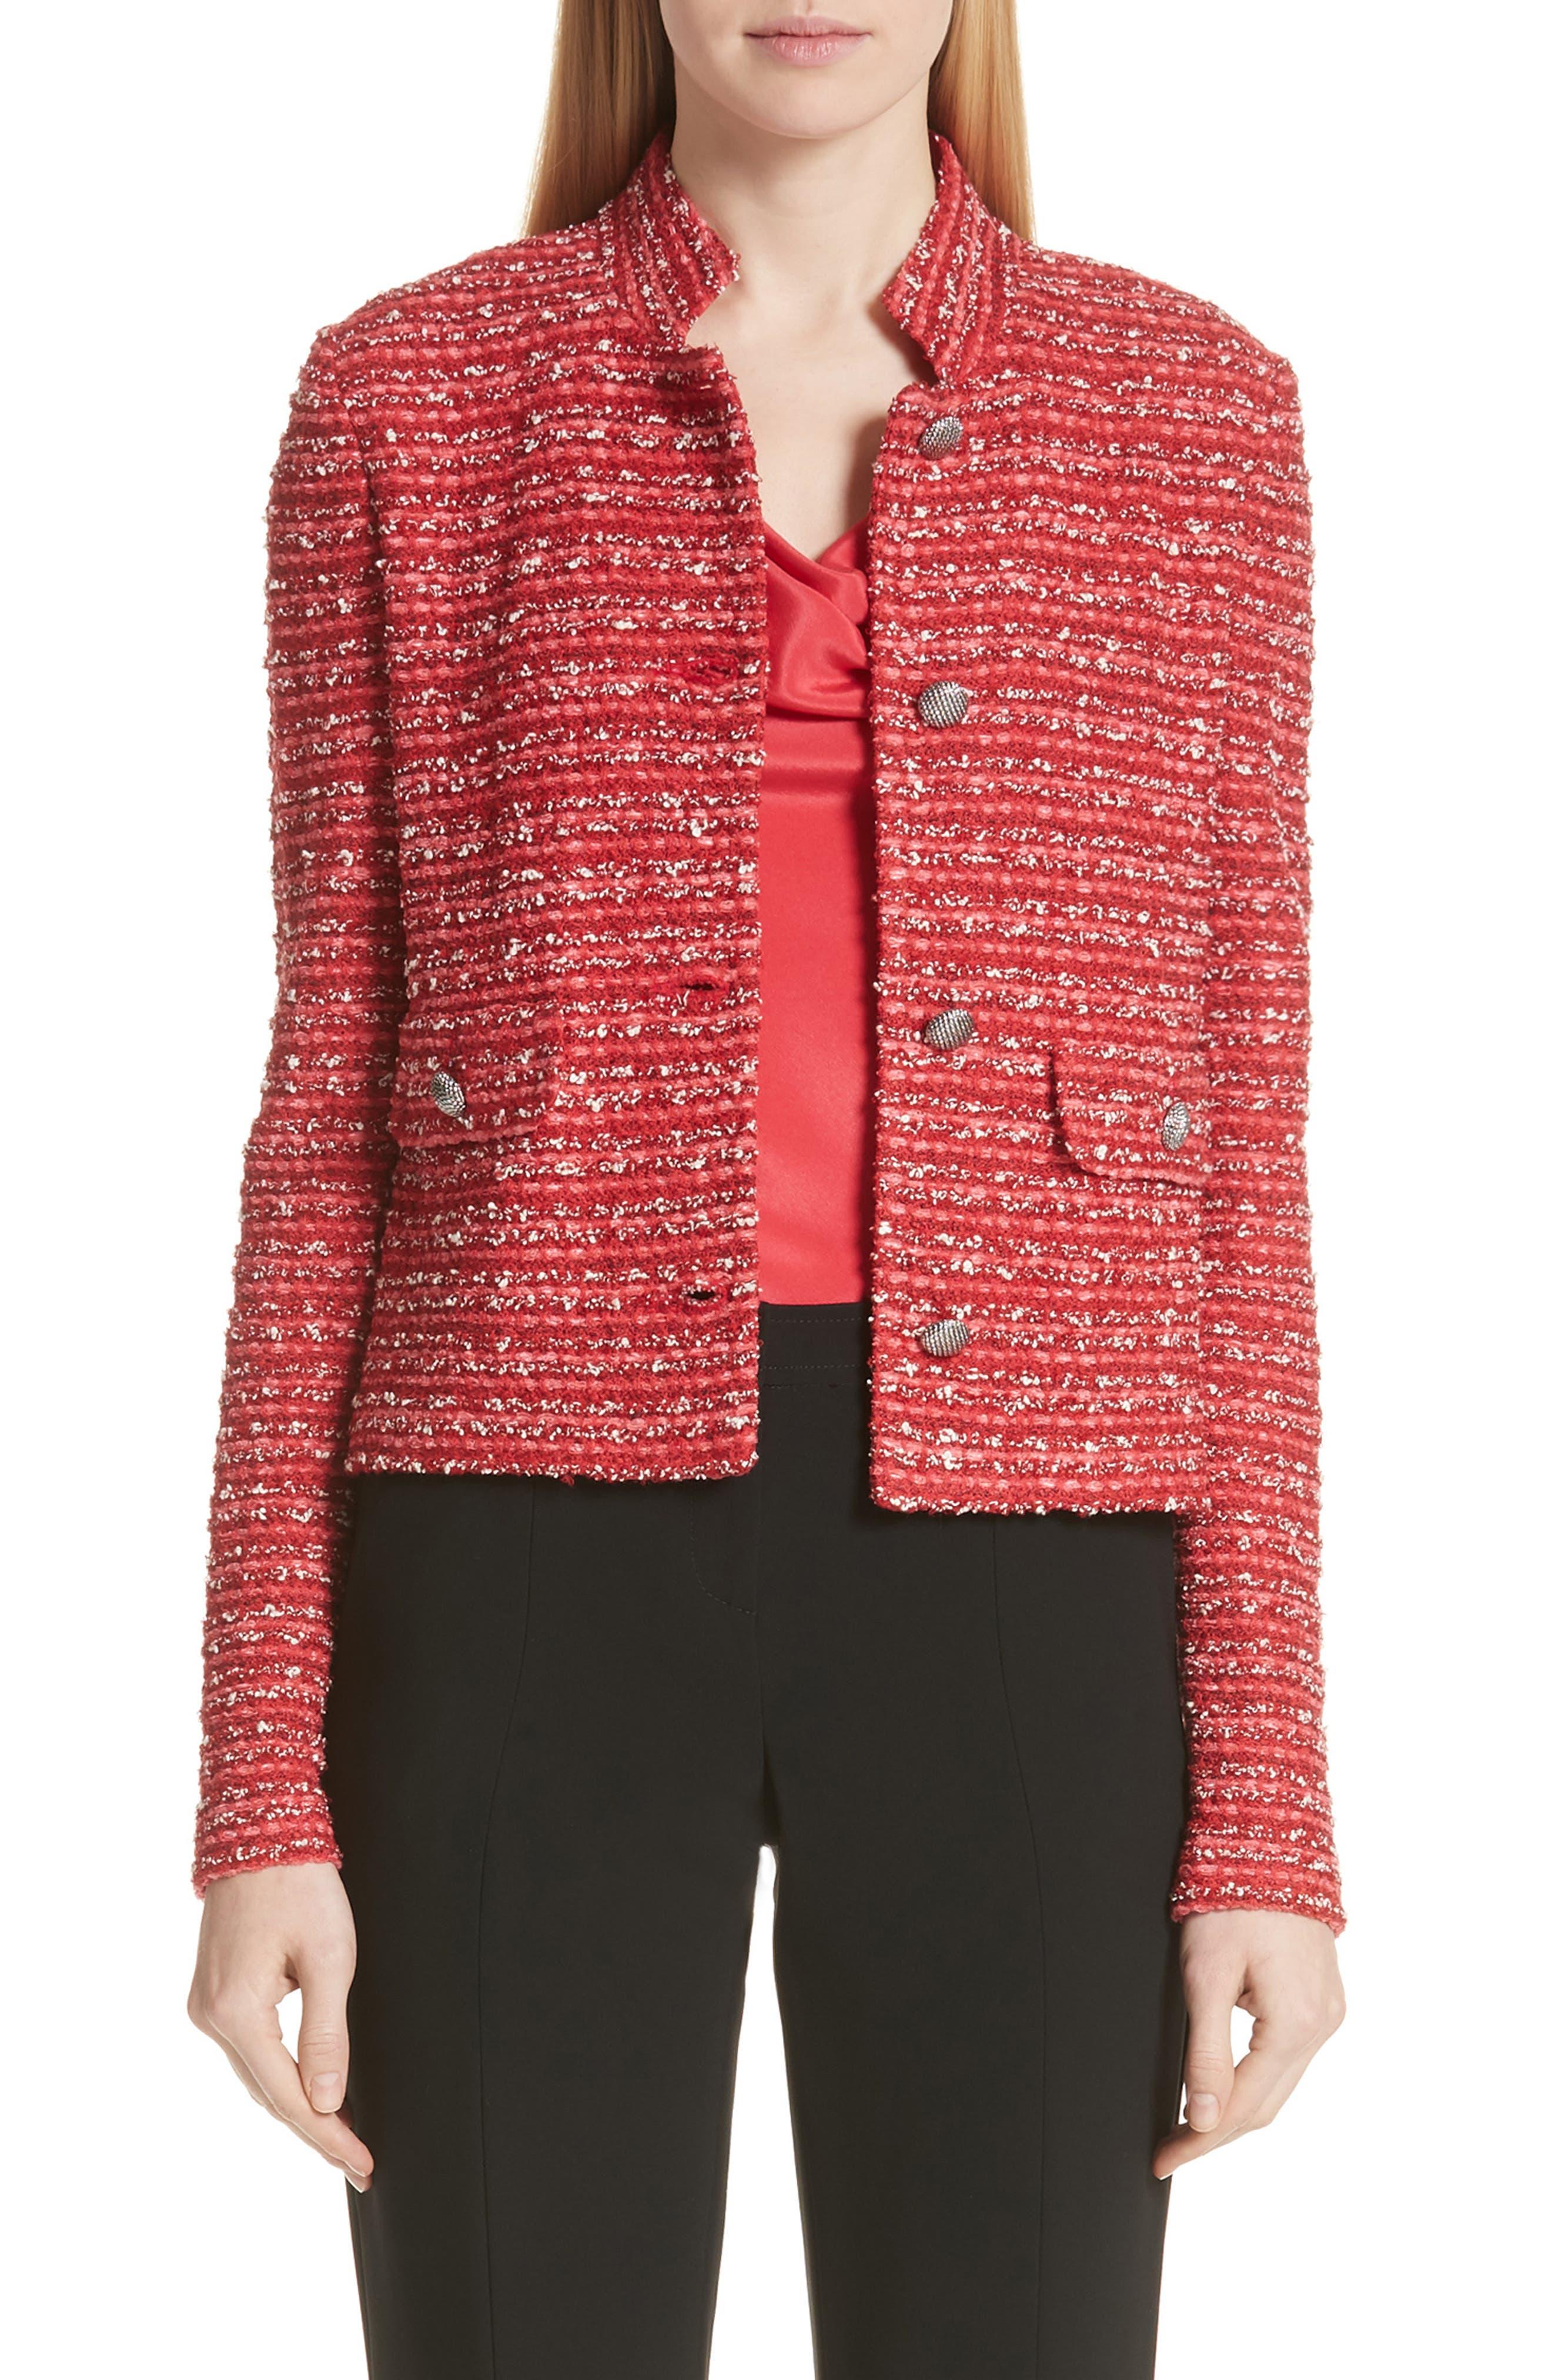 ST. JOHN Inlay Boucle Stripe Tweed Jacket in Lingonberry Multi